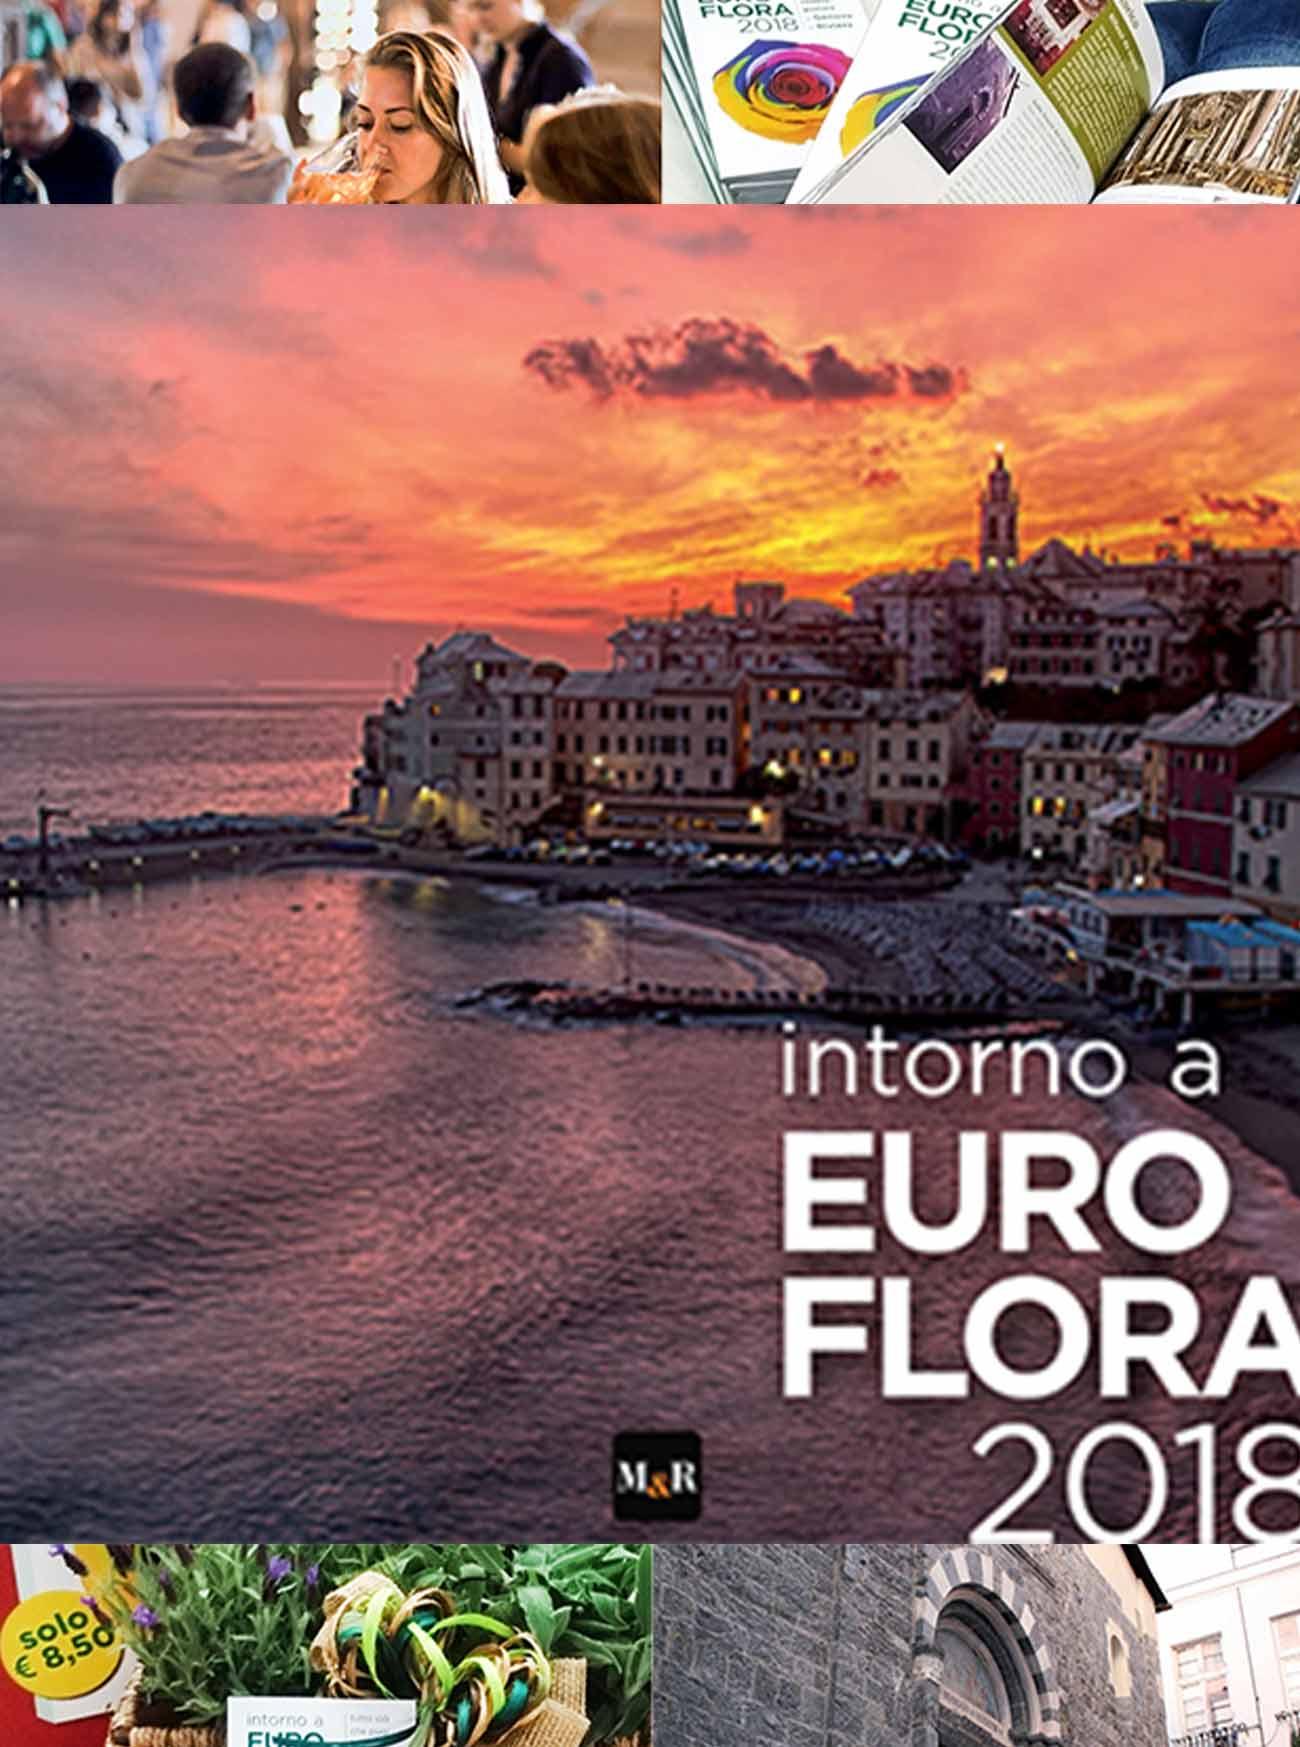 euroflora-2018-clienti-mercomm-agenzia-comunicazione